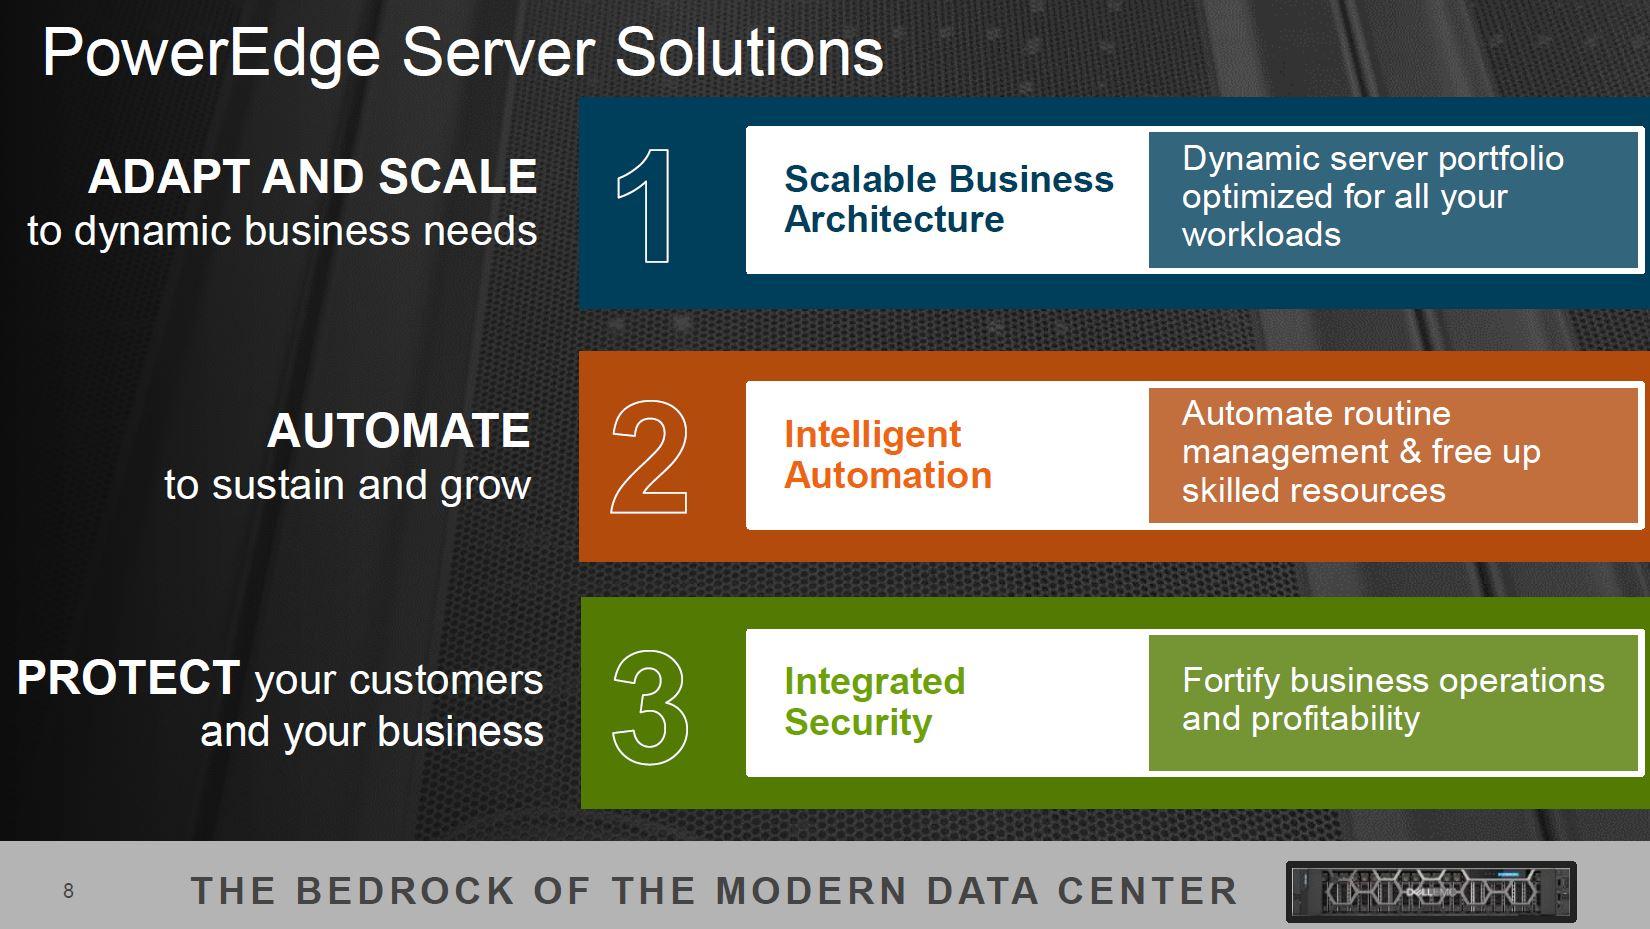 Dell EMC 14th Generation PowerEdge Server Solutions